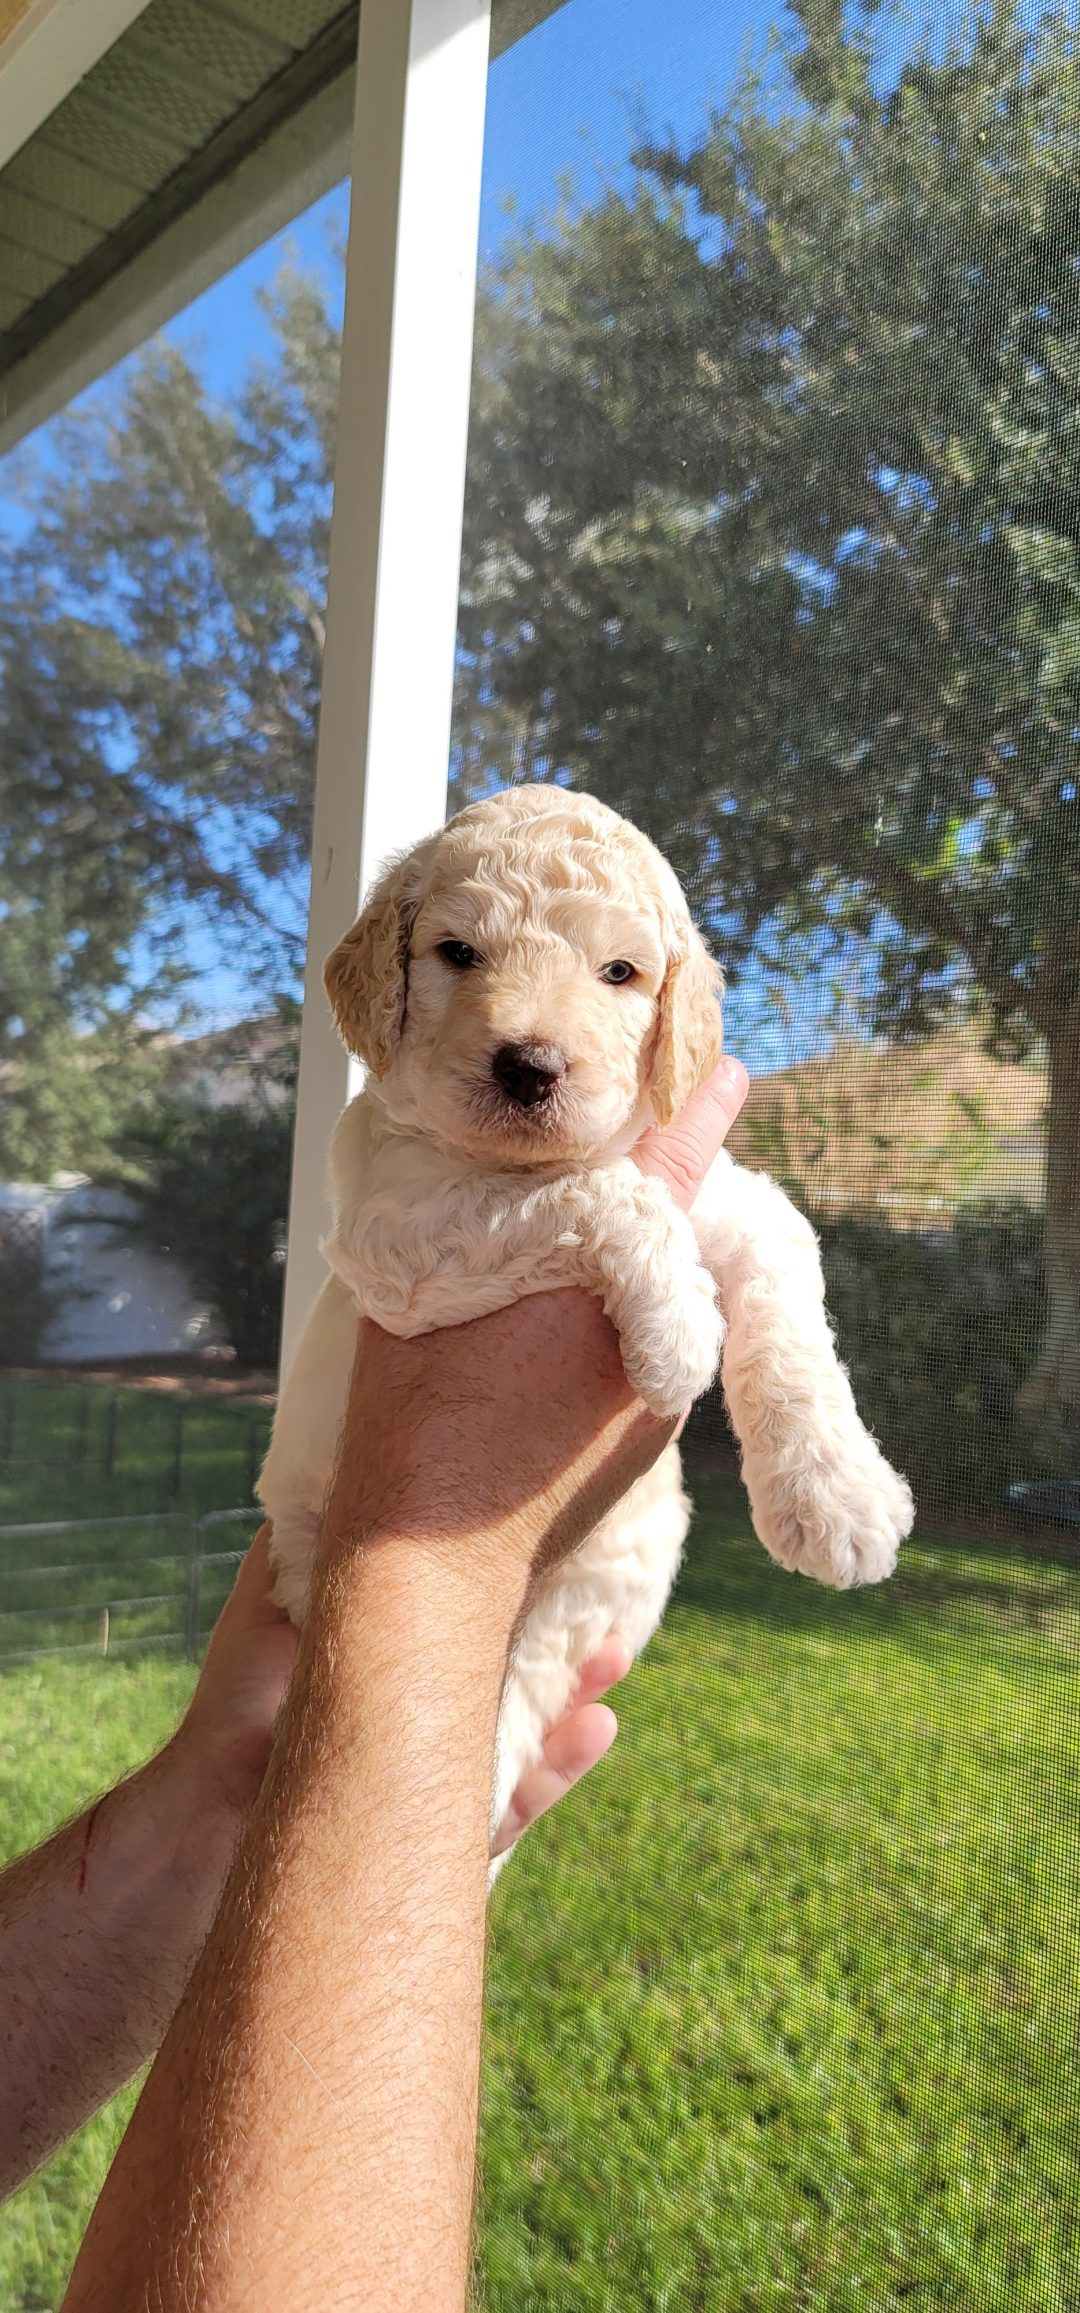 Zeta - AKC Goldendoodle male pup for sale at Melbourne, Florida